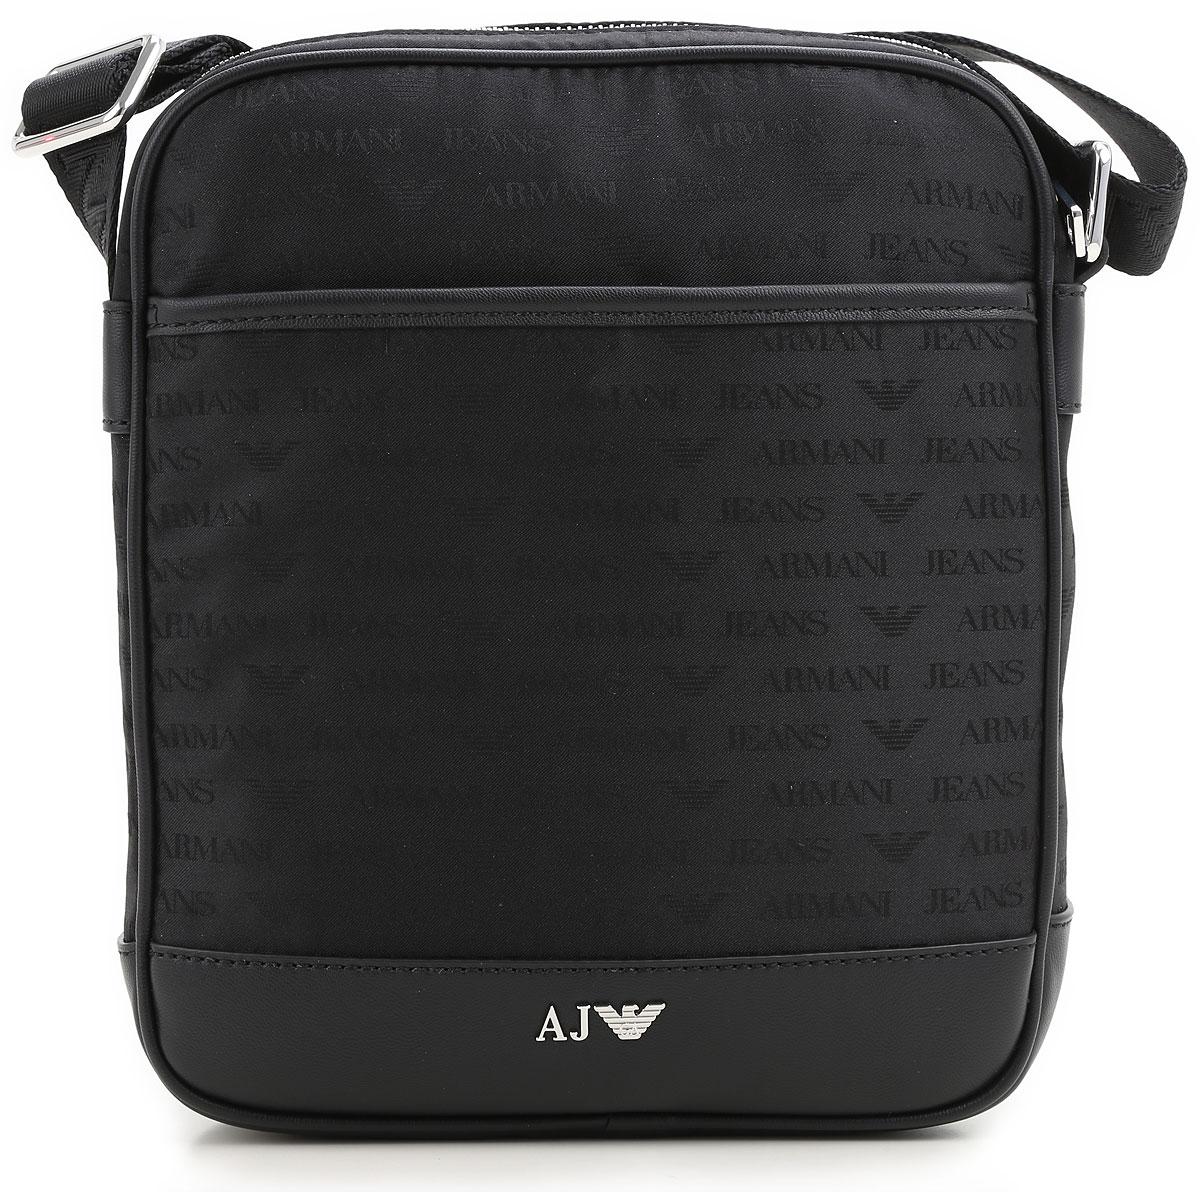 Armani Jeans. Bags for Men 16f4e85969b31